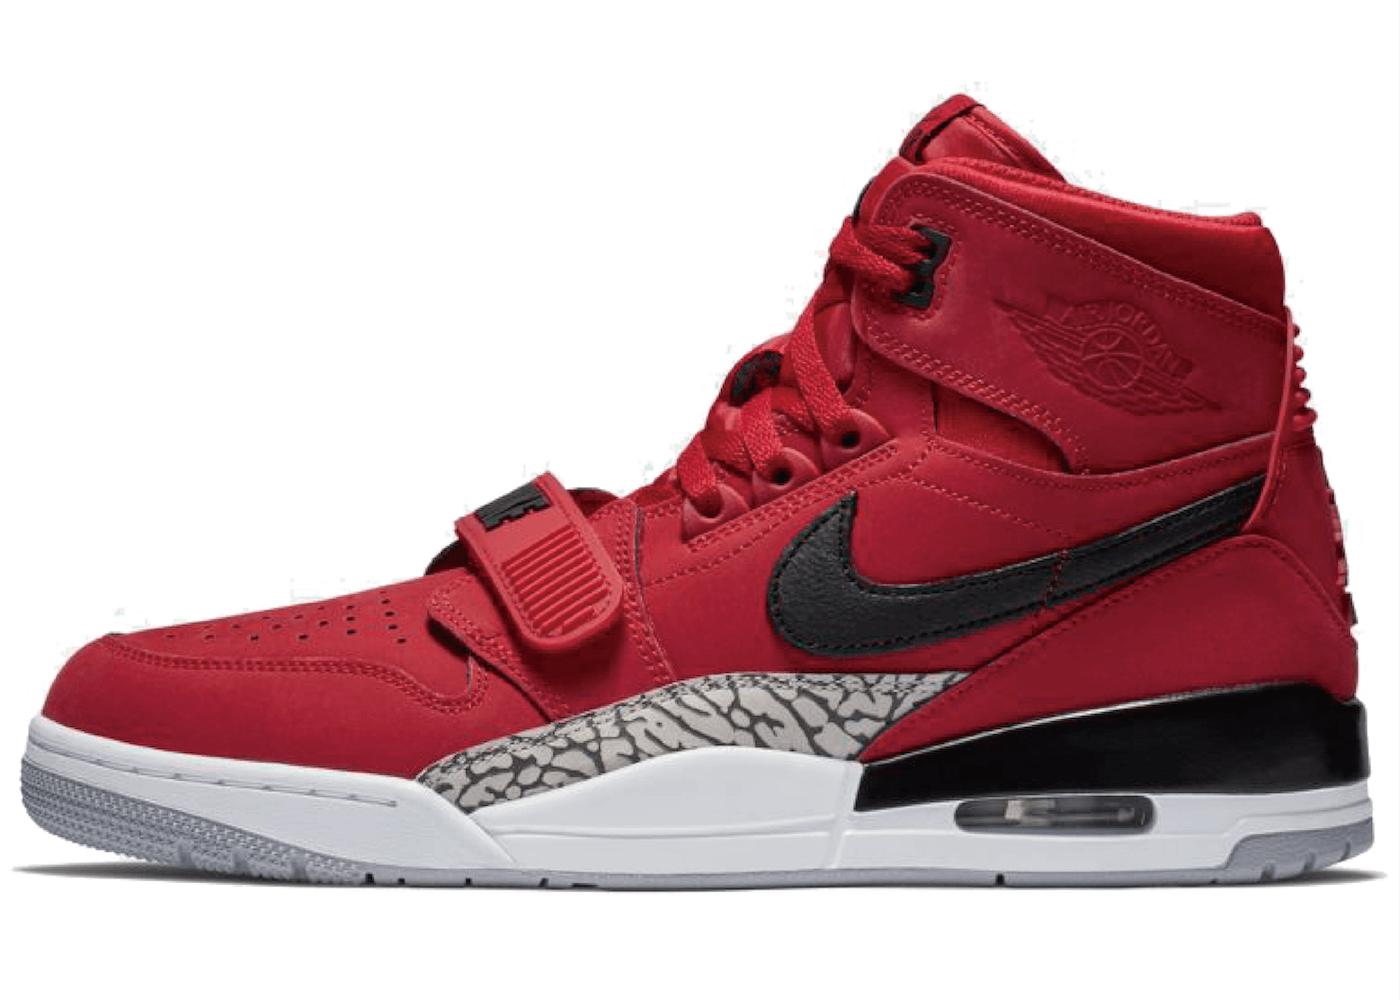 Nike Jordan Legacy 312 Toroの写真